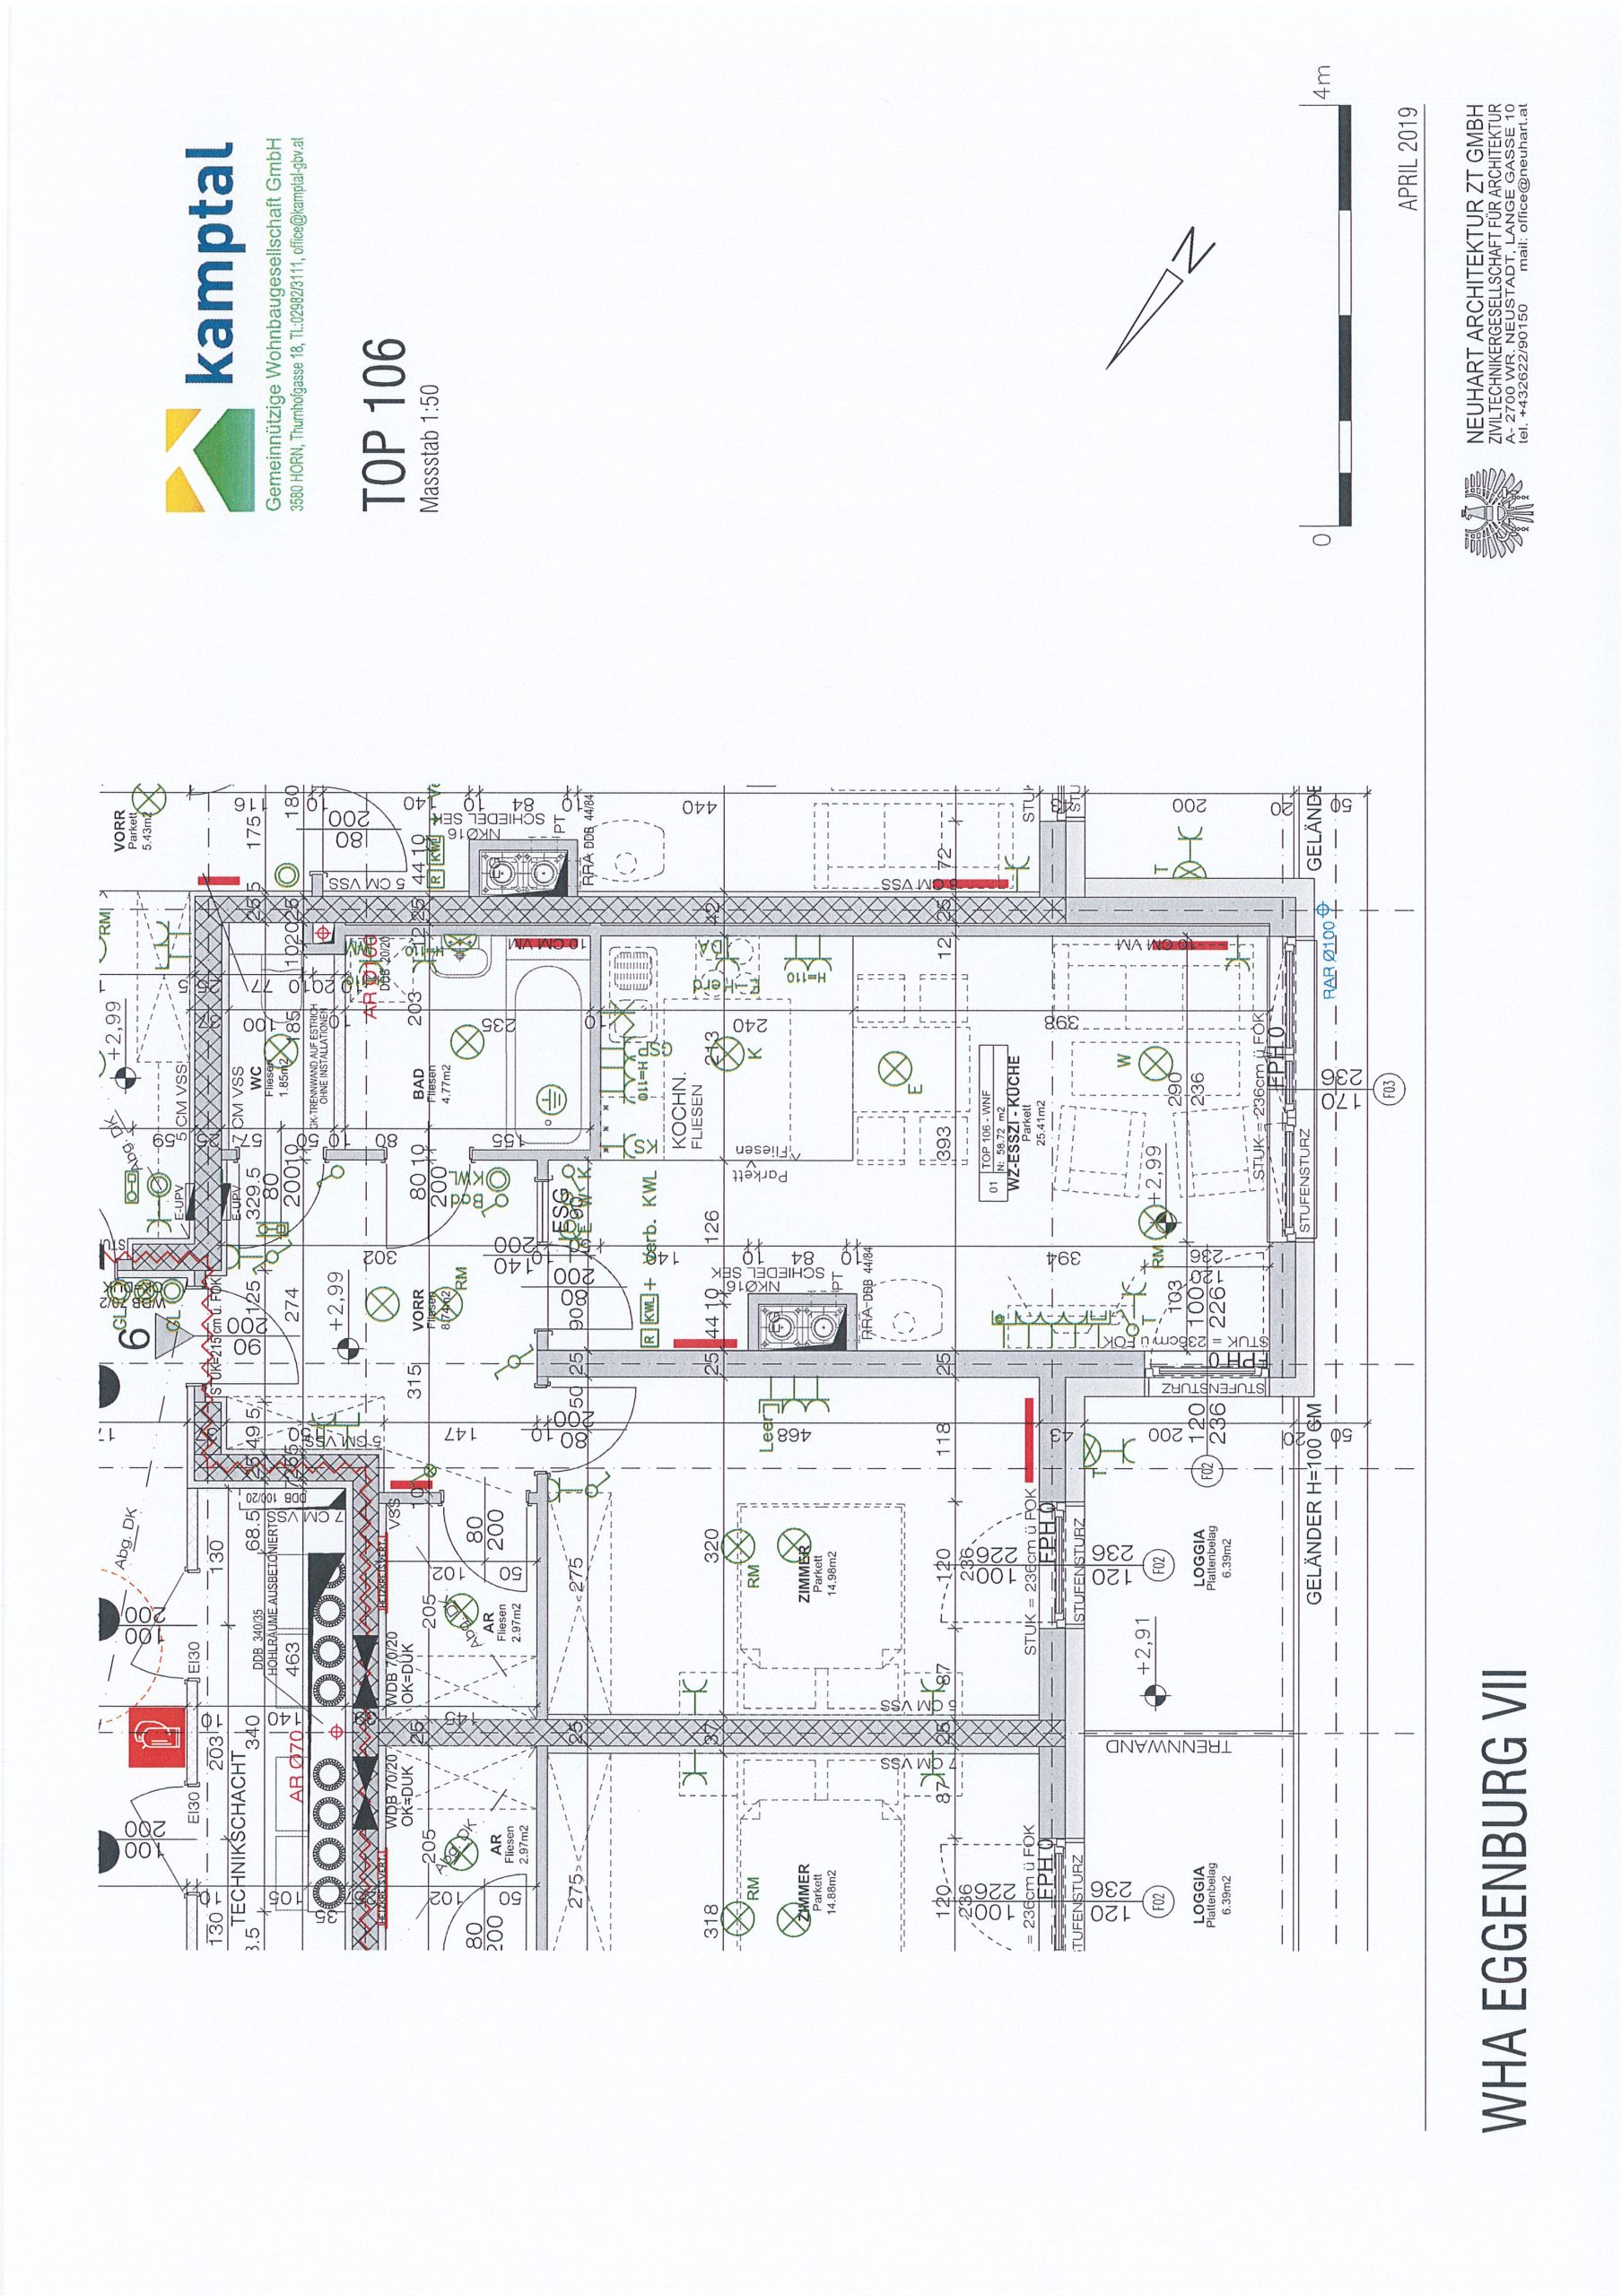 Immobilie von Kamptal in 3730 Eggenburg, Horn, Eggenburg VII - Top 106 #9